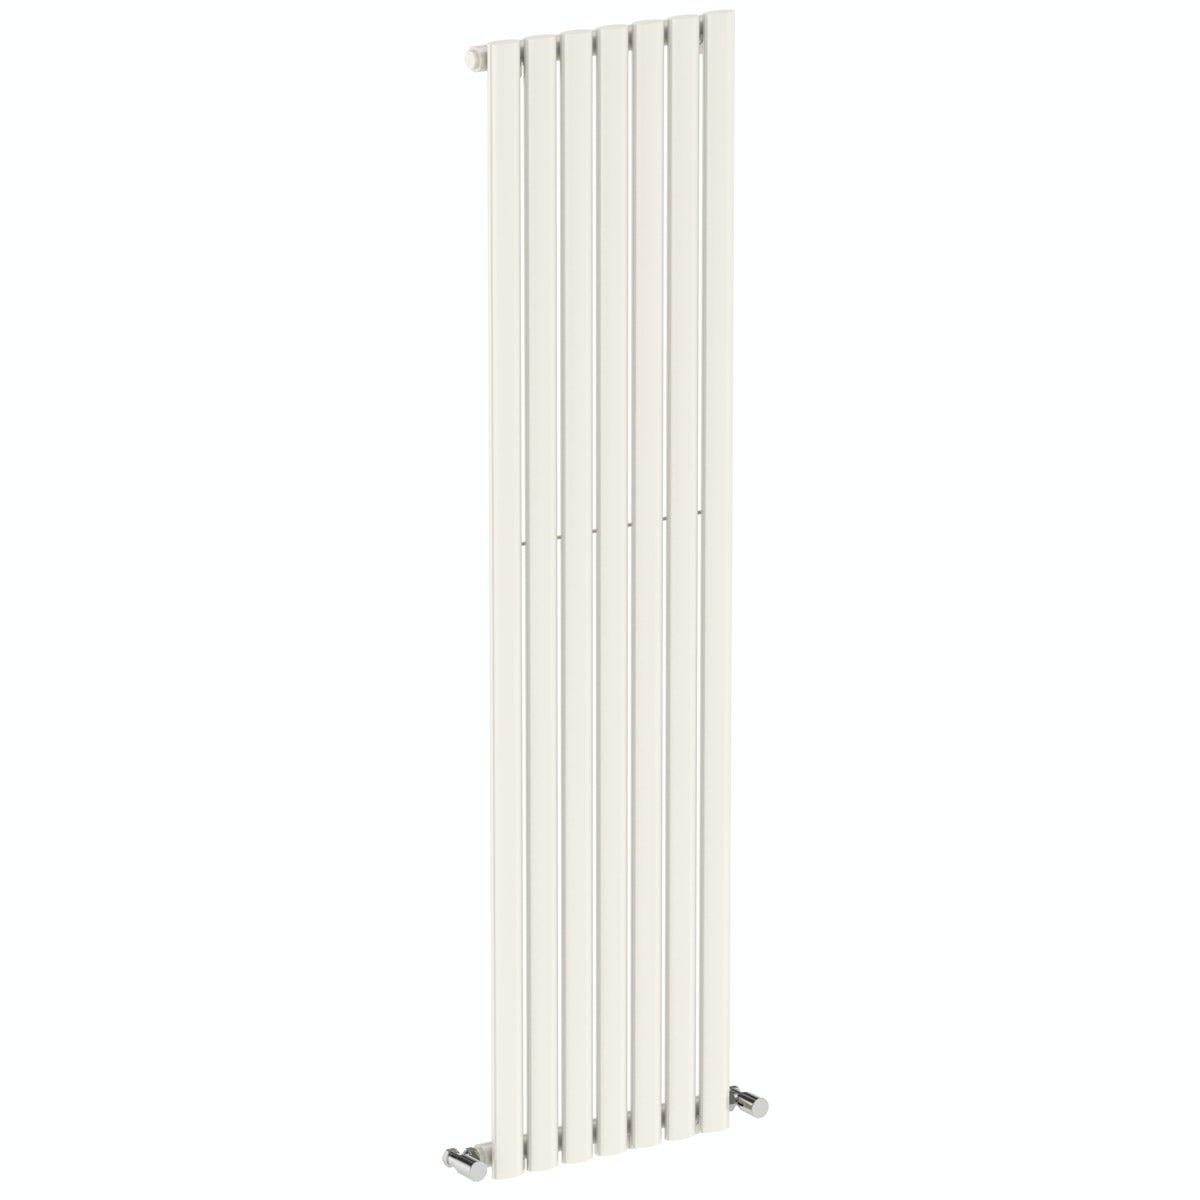 Mode Tate white single vertical radiator 1600 x 406